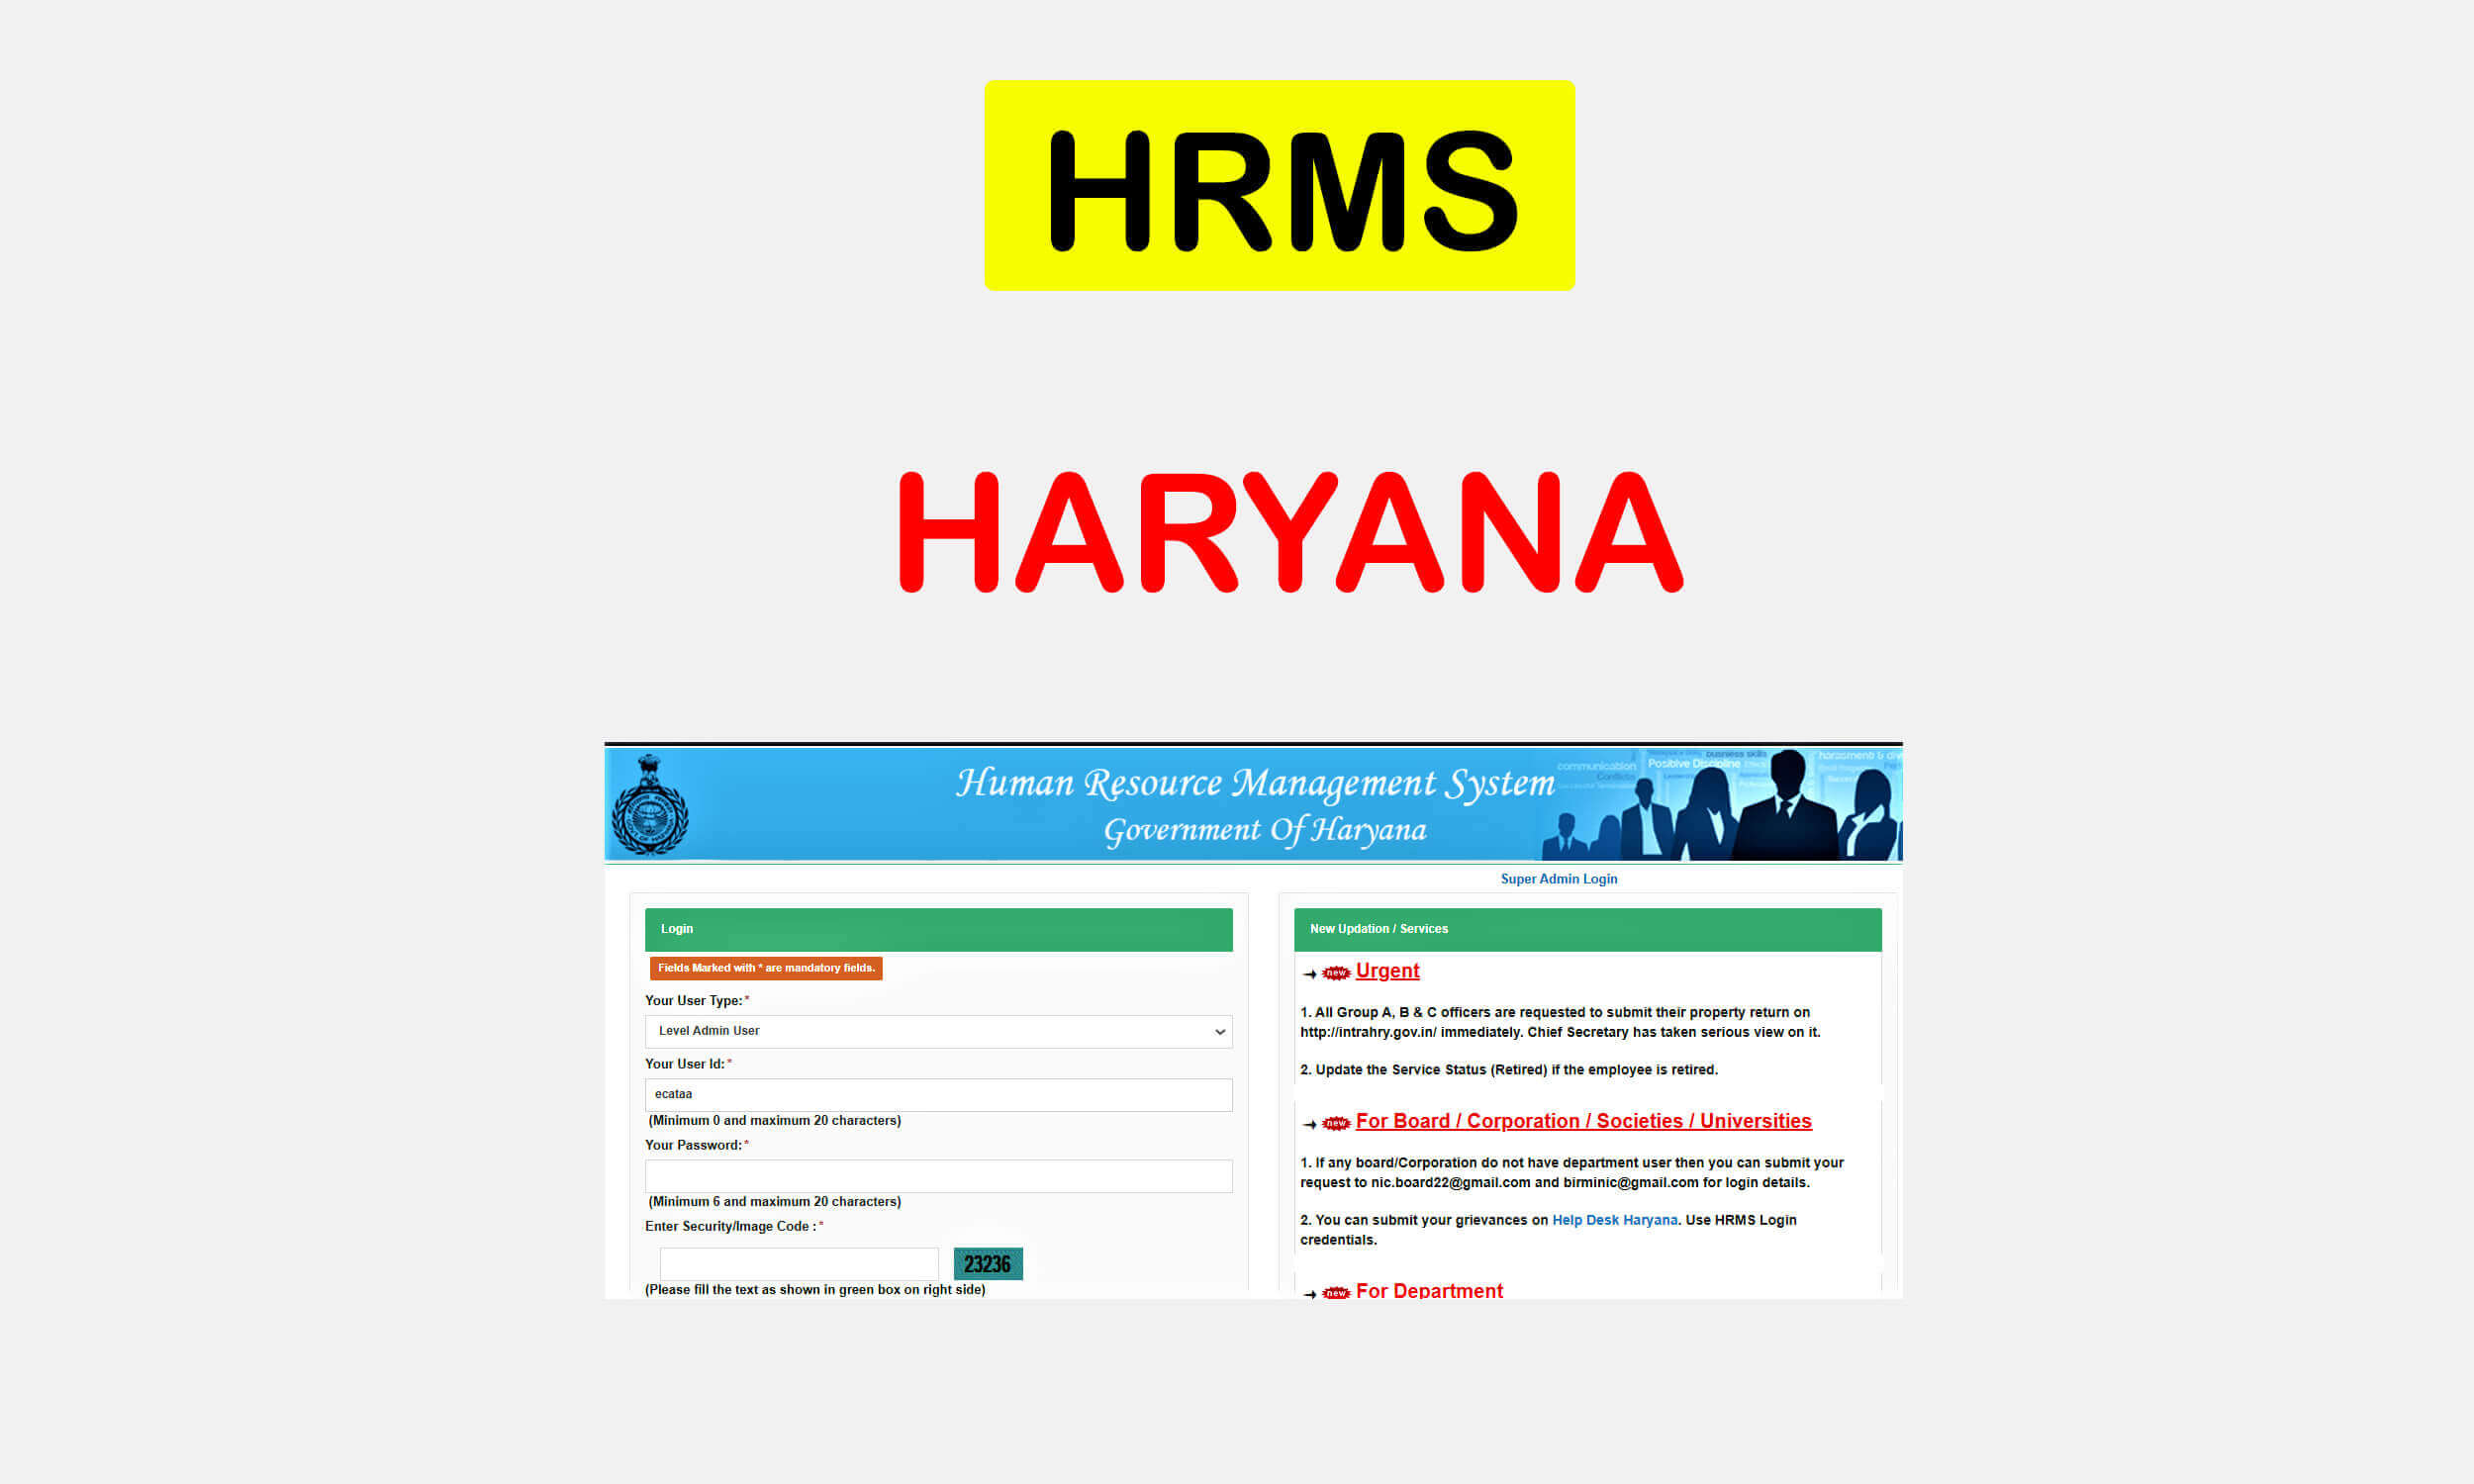 hrms haryana